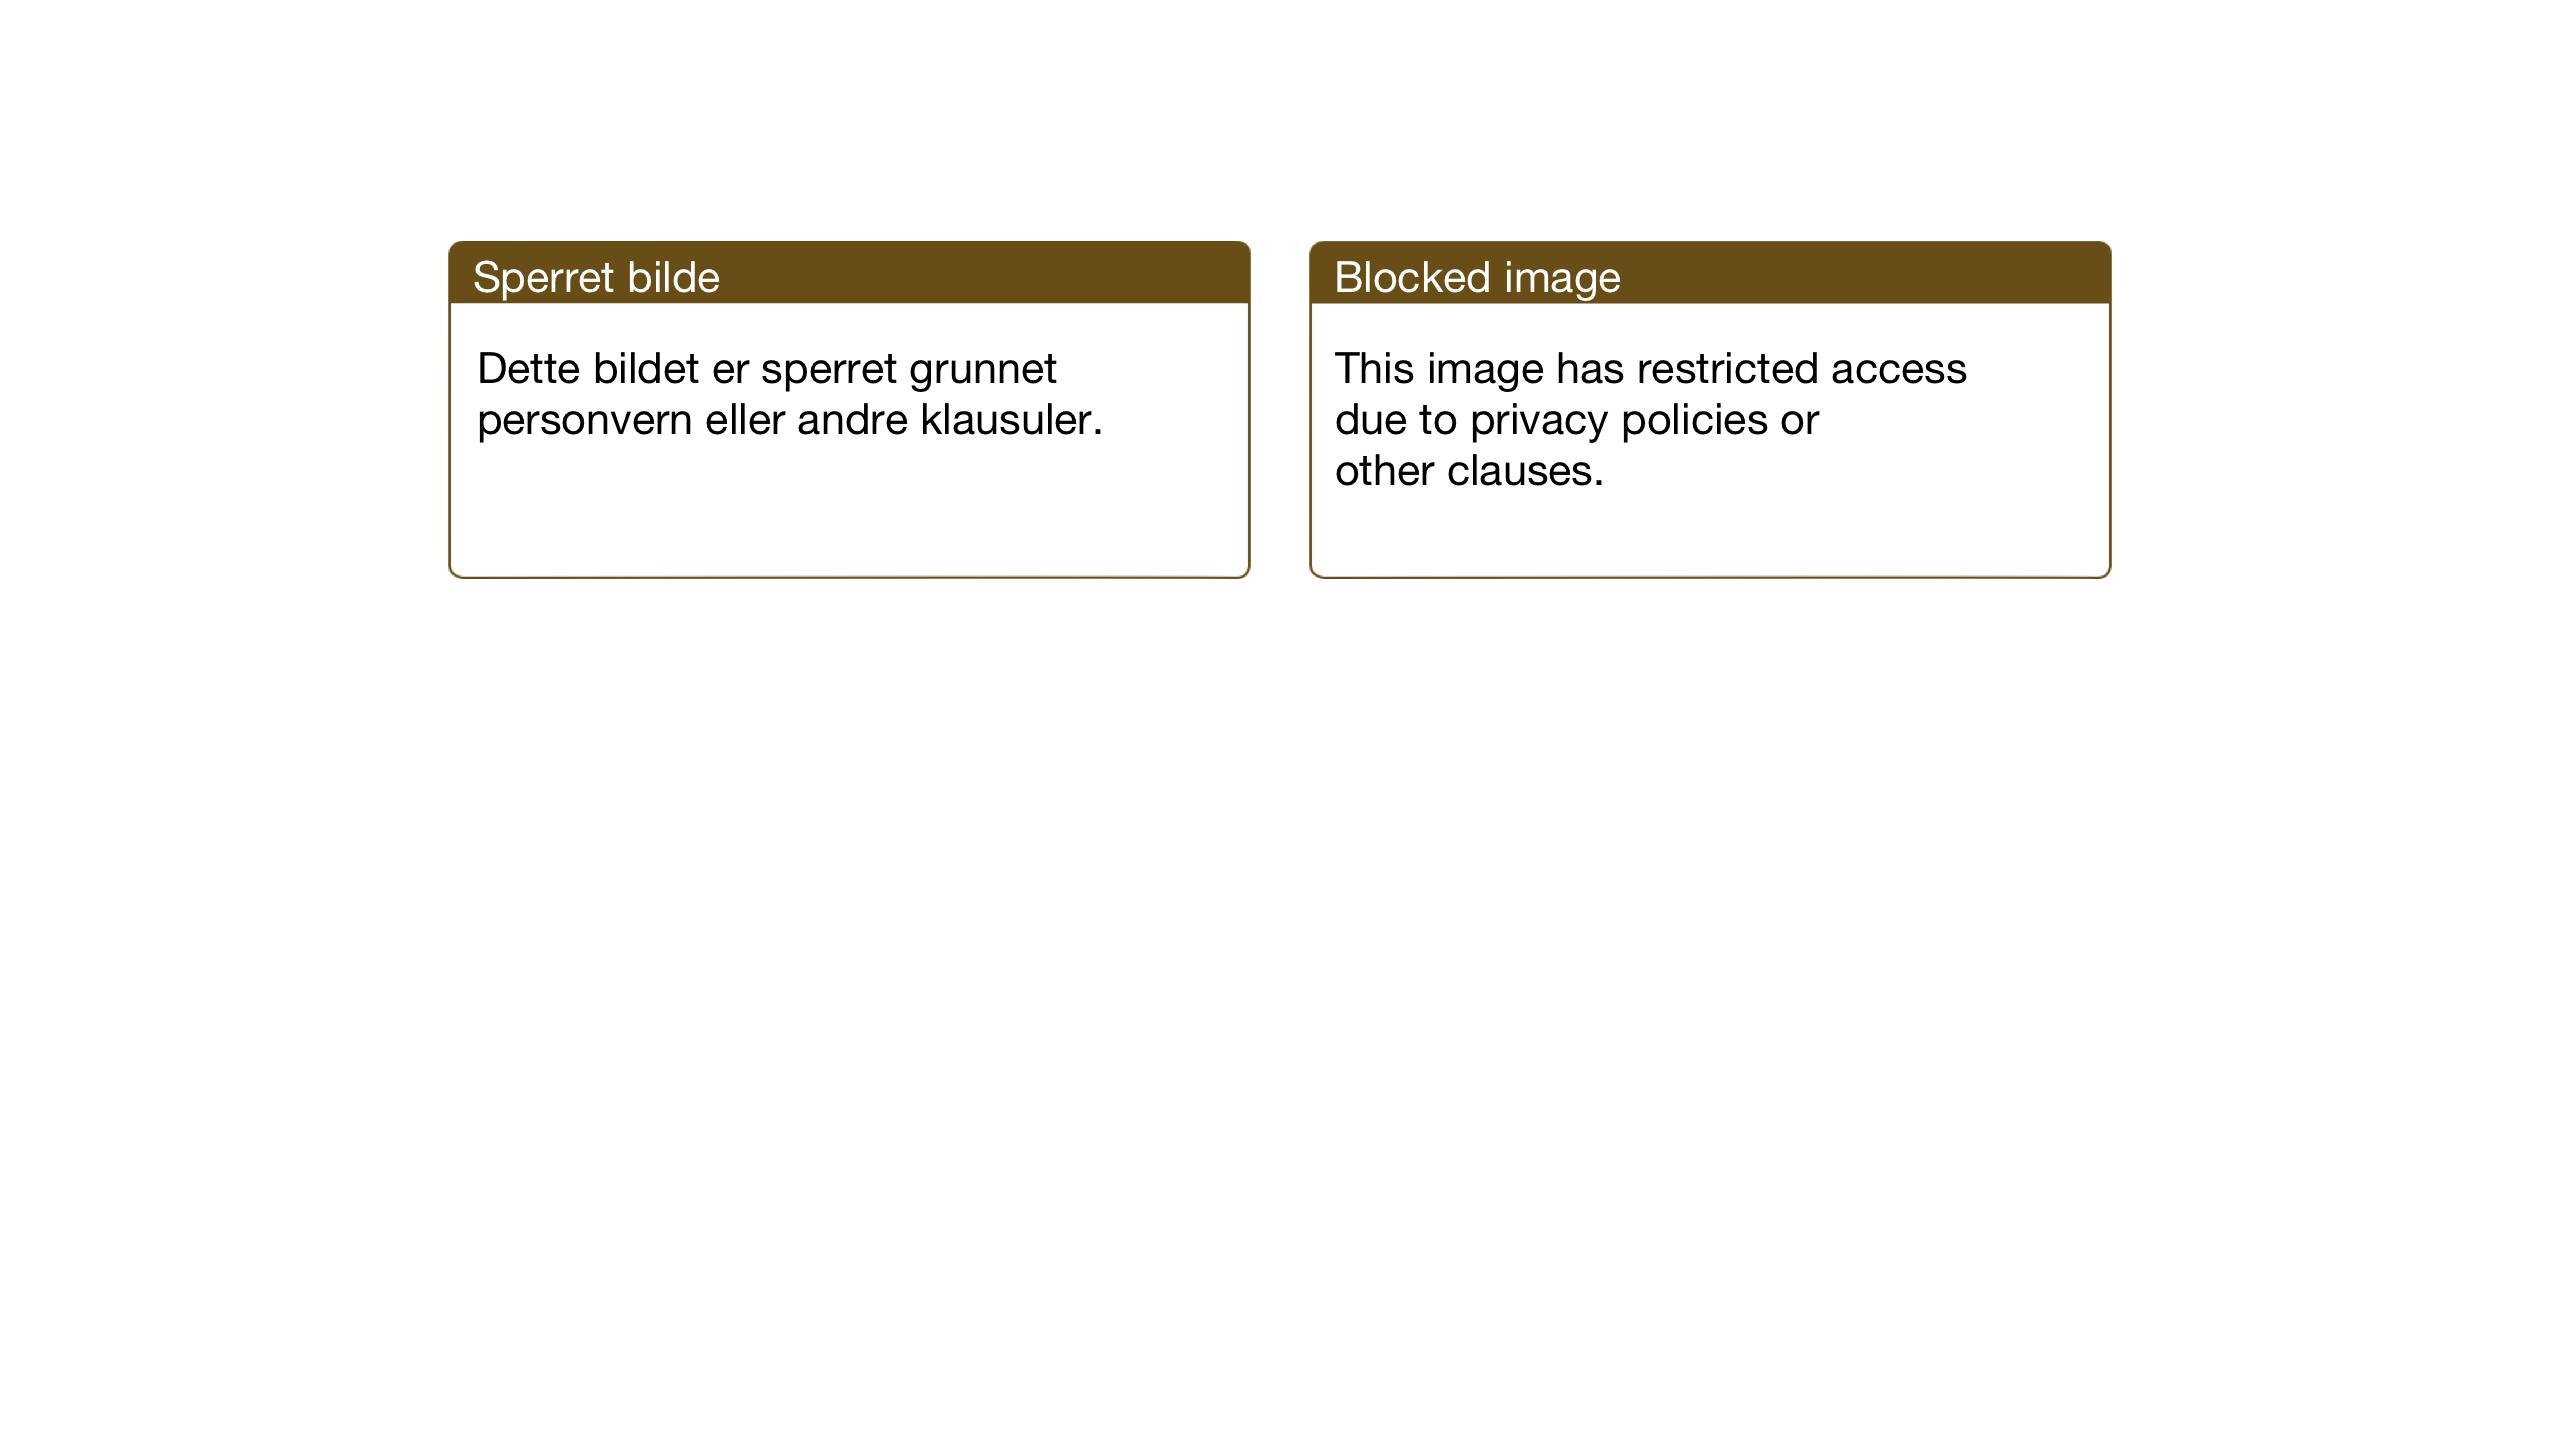 SAH, Vardal prestekontor, H/Ha/Haa/L0018: Ministerialbok nr. 18, 1930-1945, s. 182